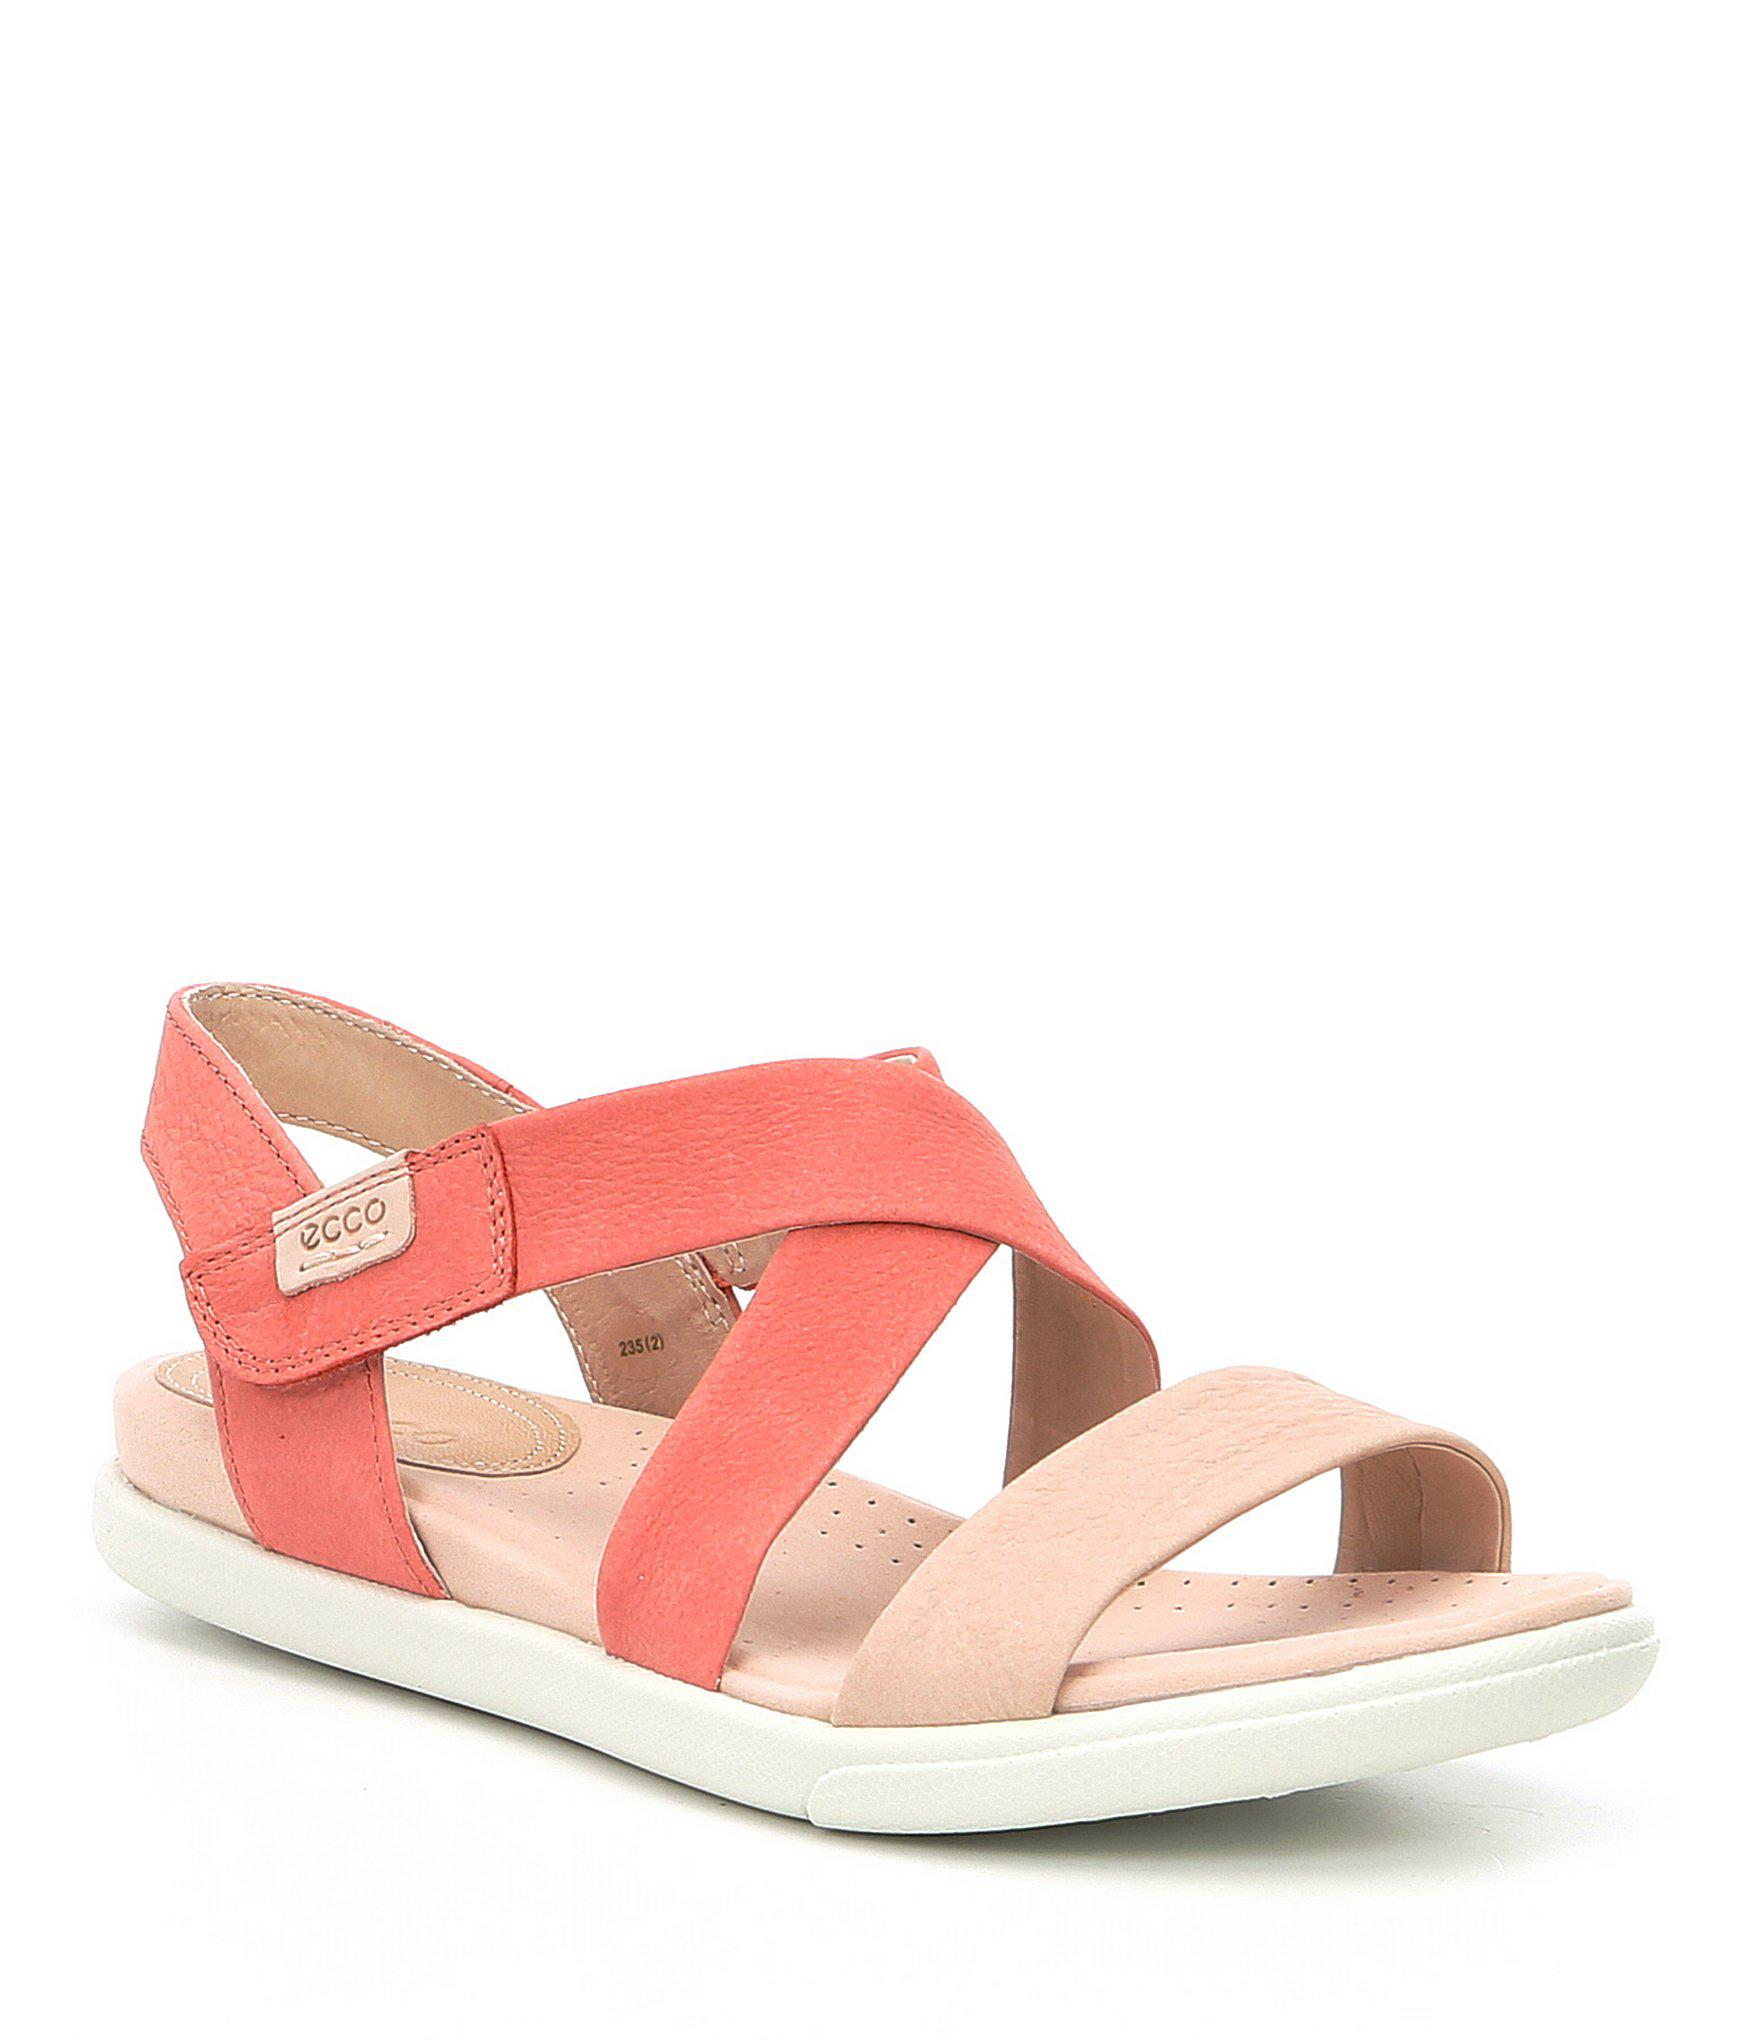 d81a86a3e436 Lyst - Ecco Damara Criss Cross Sandals in Pink